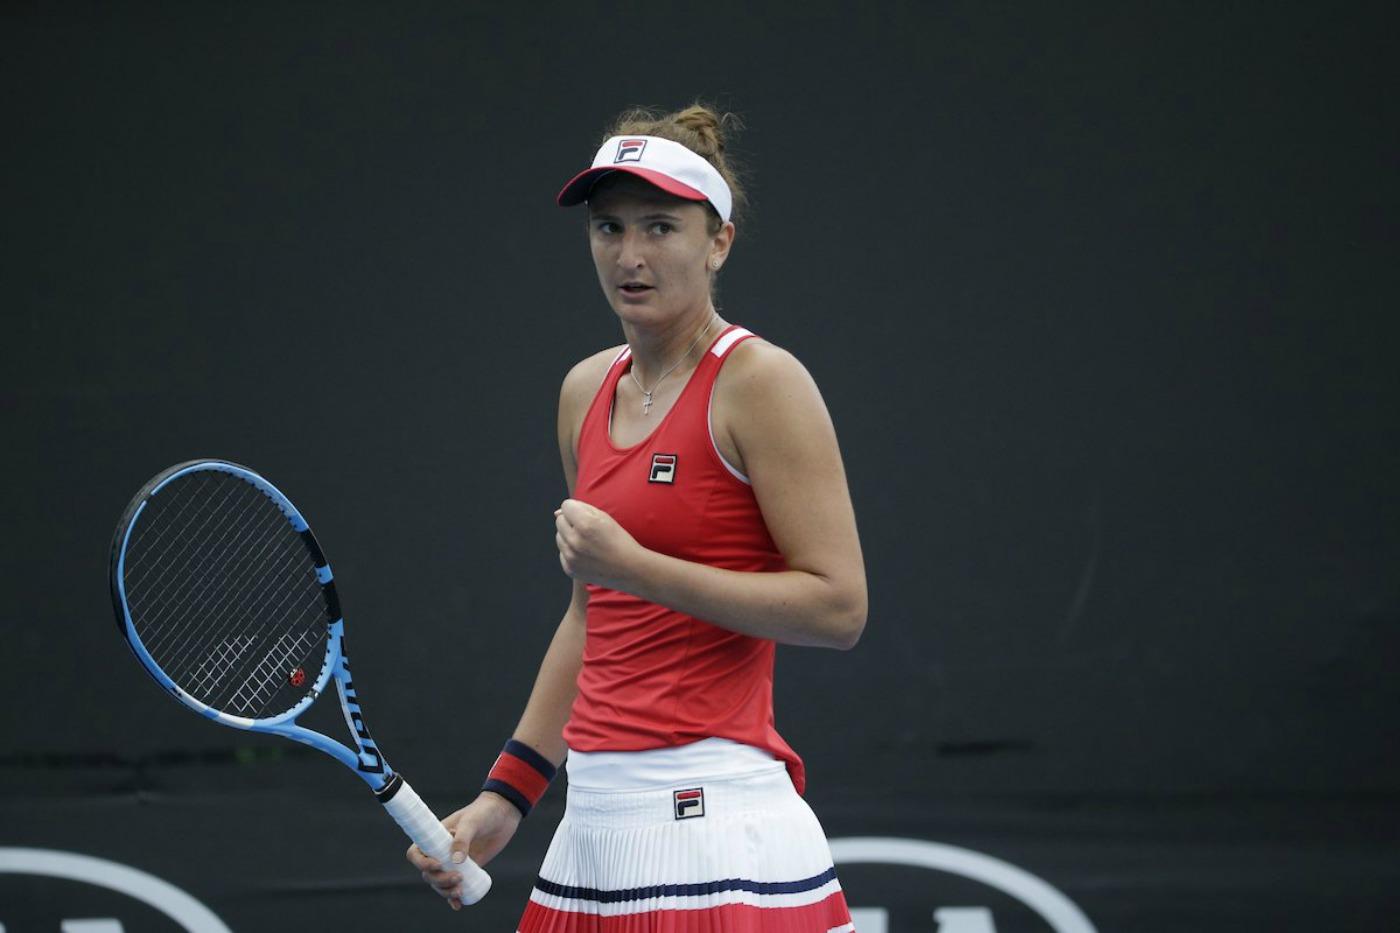 WTA Palermo 2019 - Irina Begu calificată în optimile ...  |Irina Begu